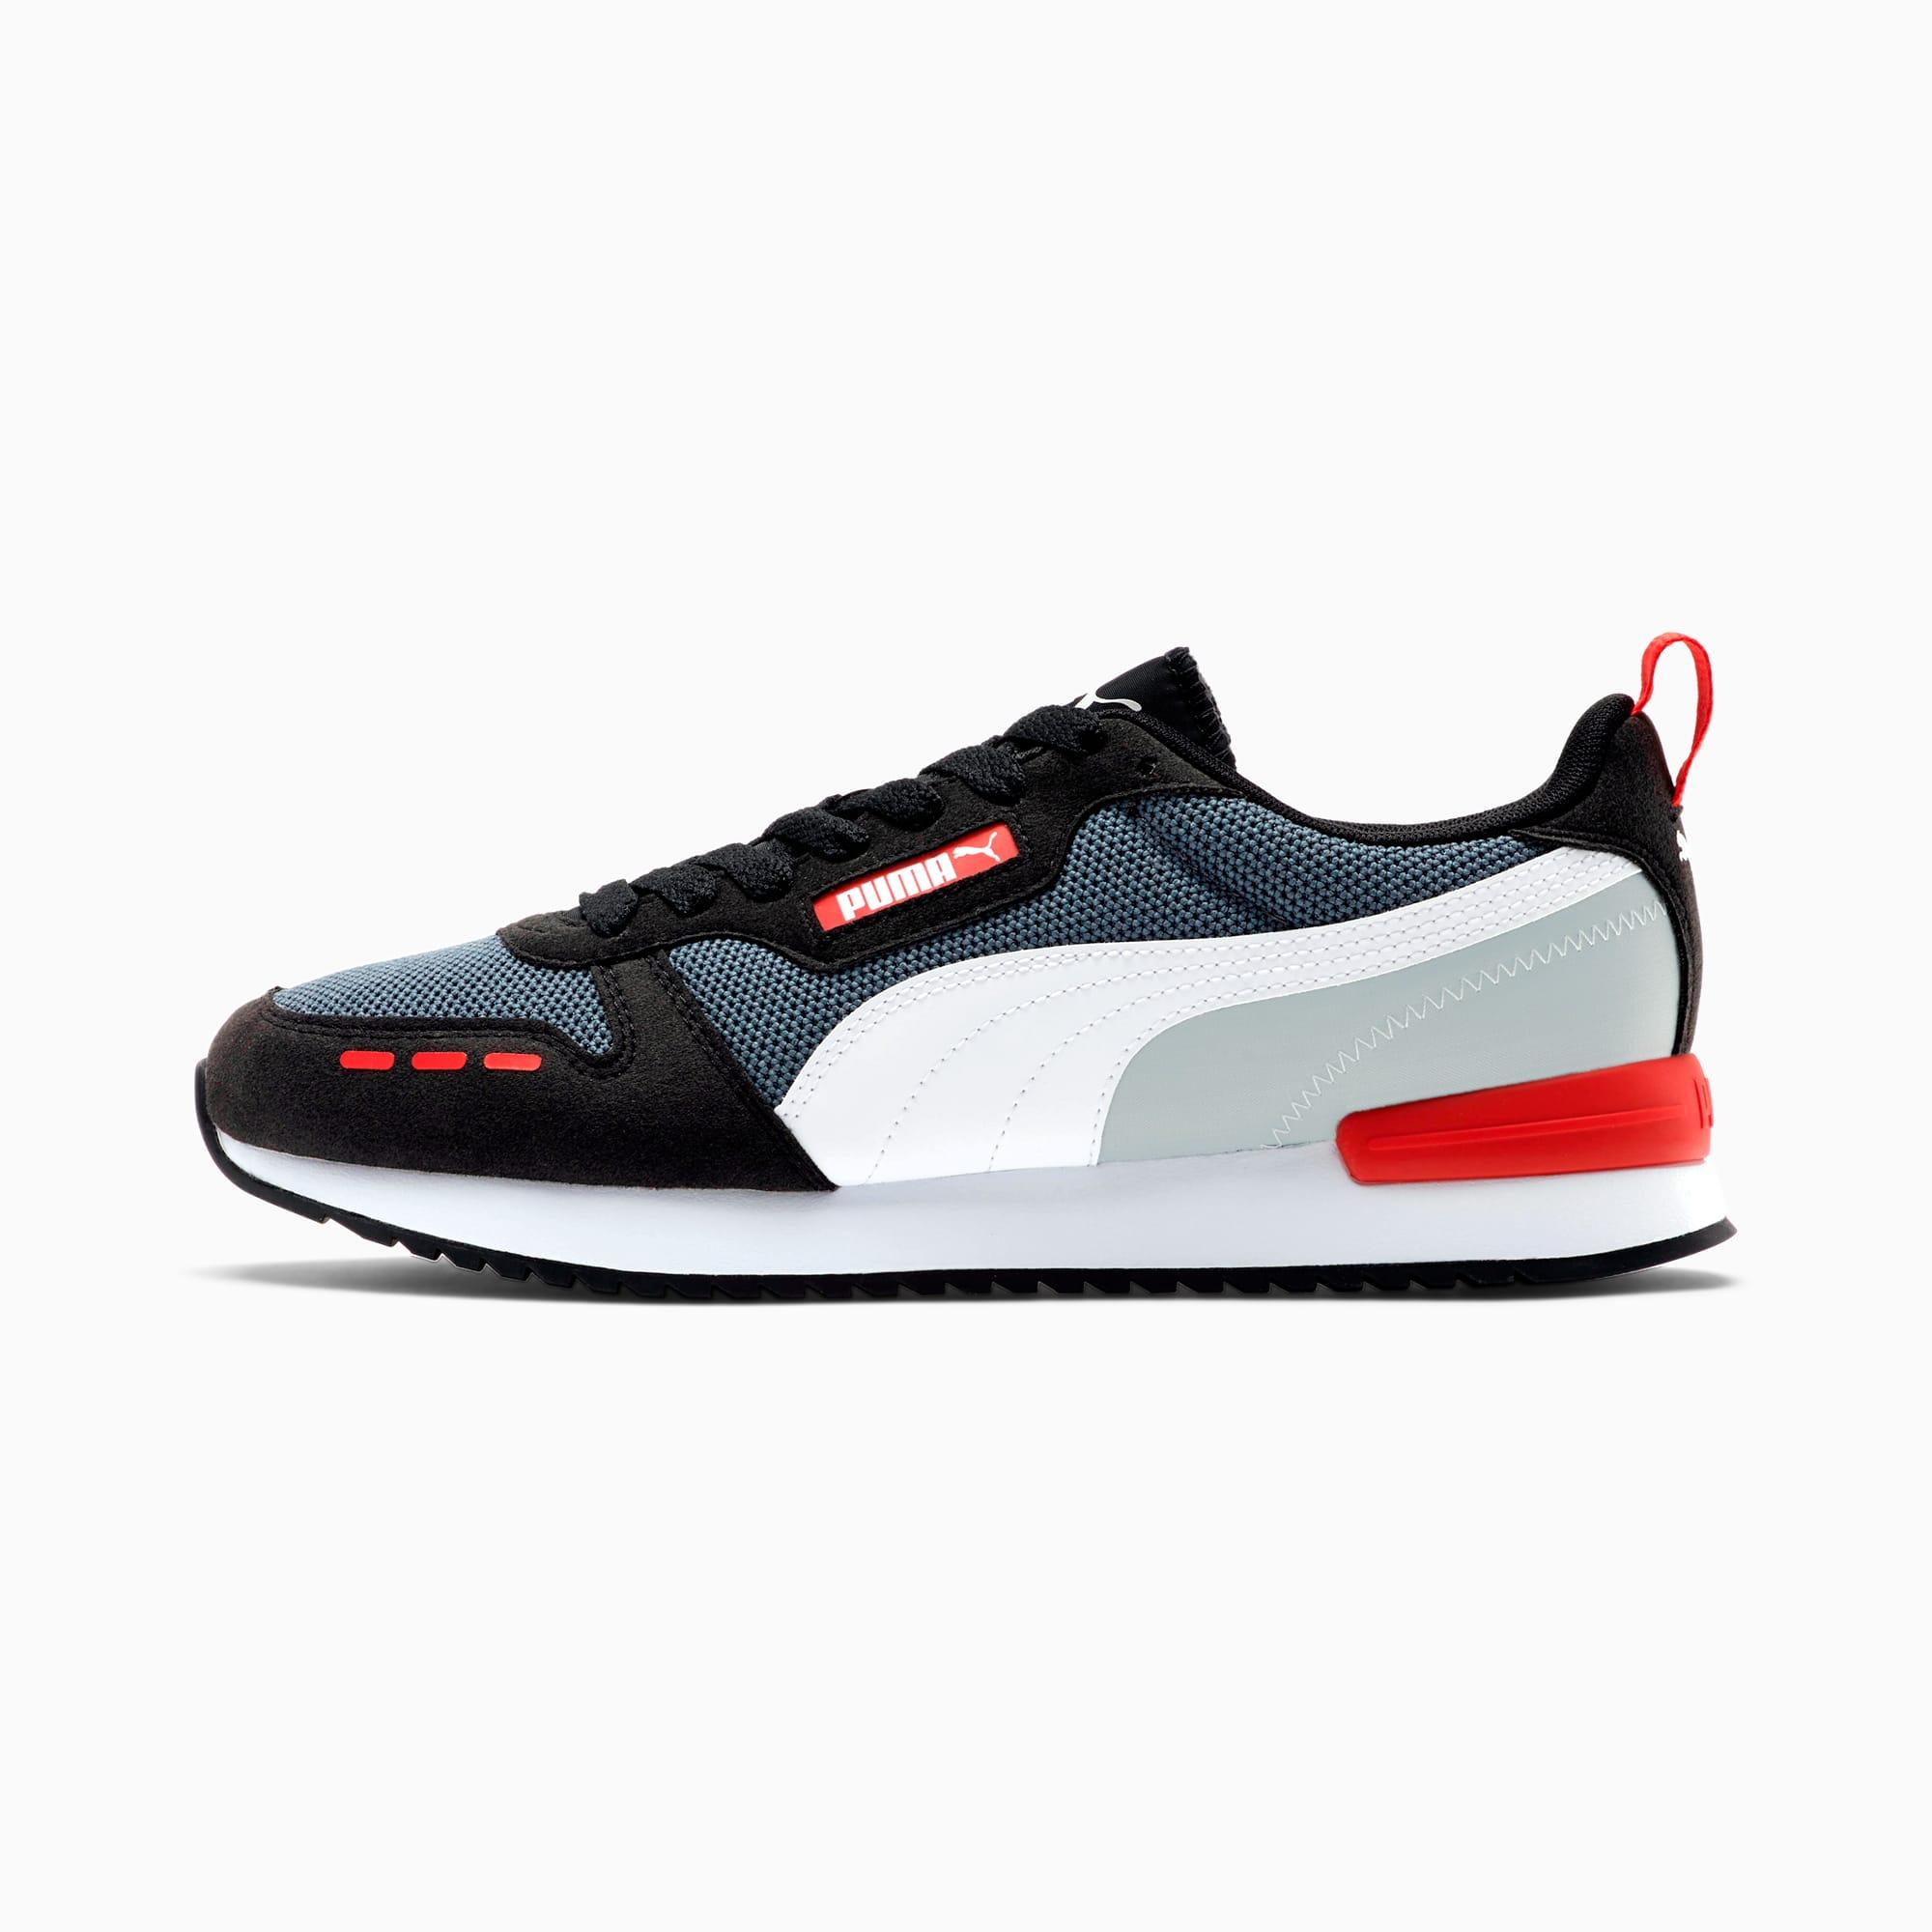 PUMA R78 Lightweight Running Men's Sneakers (Castlerock-Black-White)